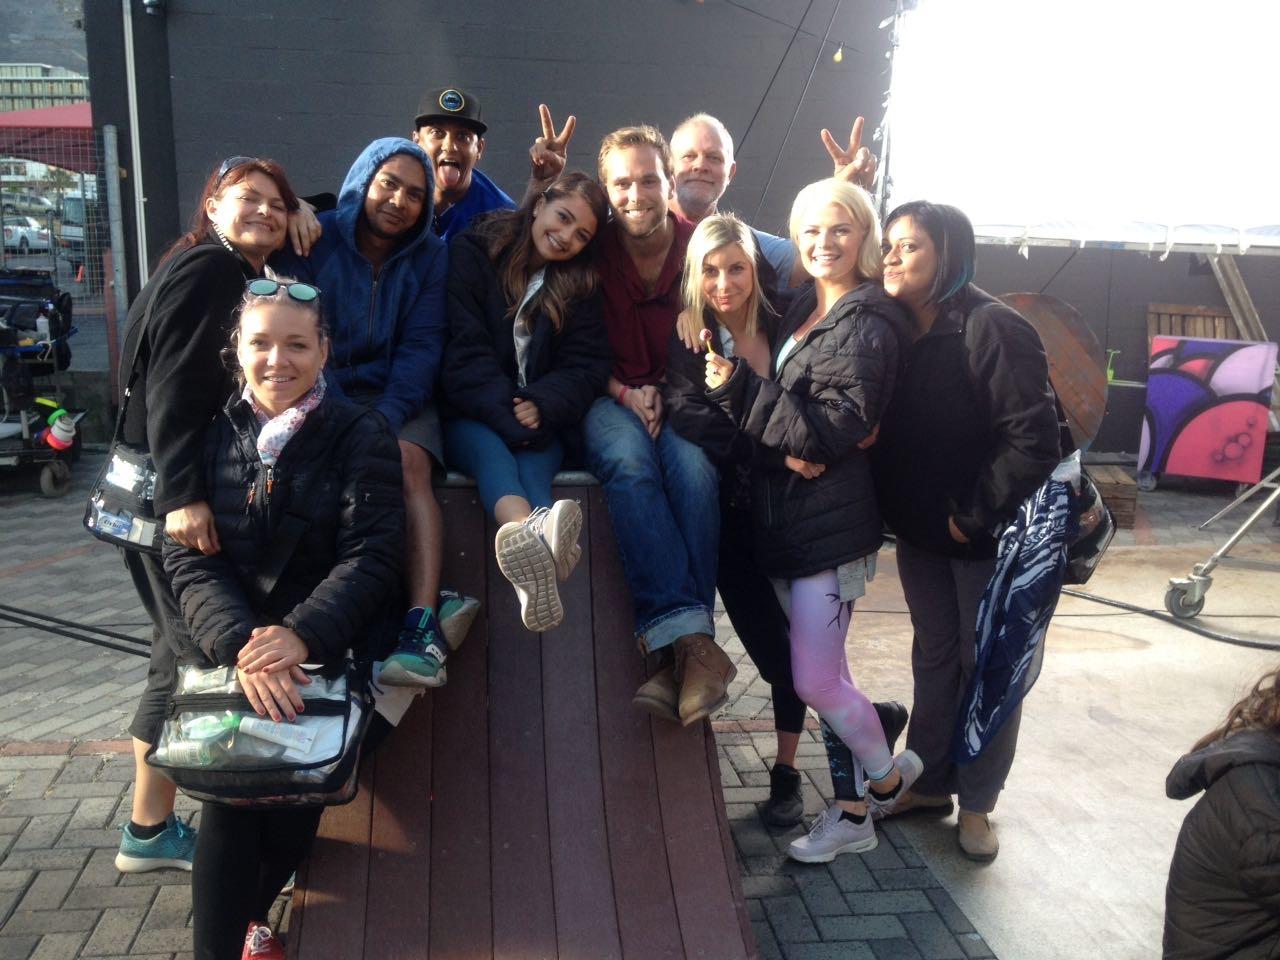 Killer team on the dance movie. #bringiton